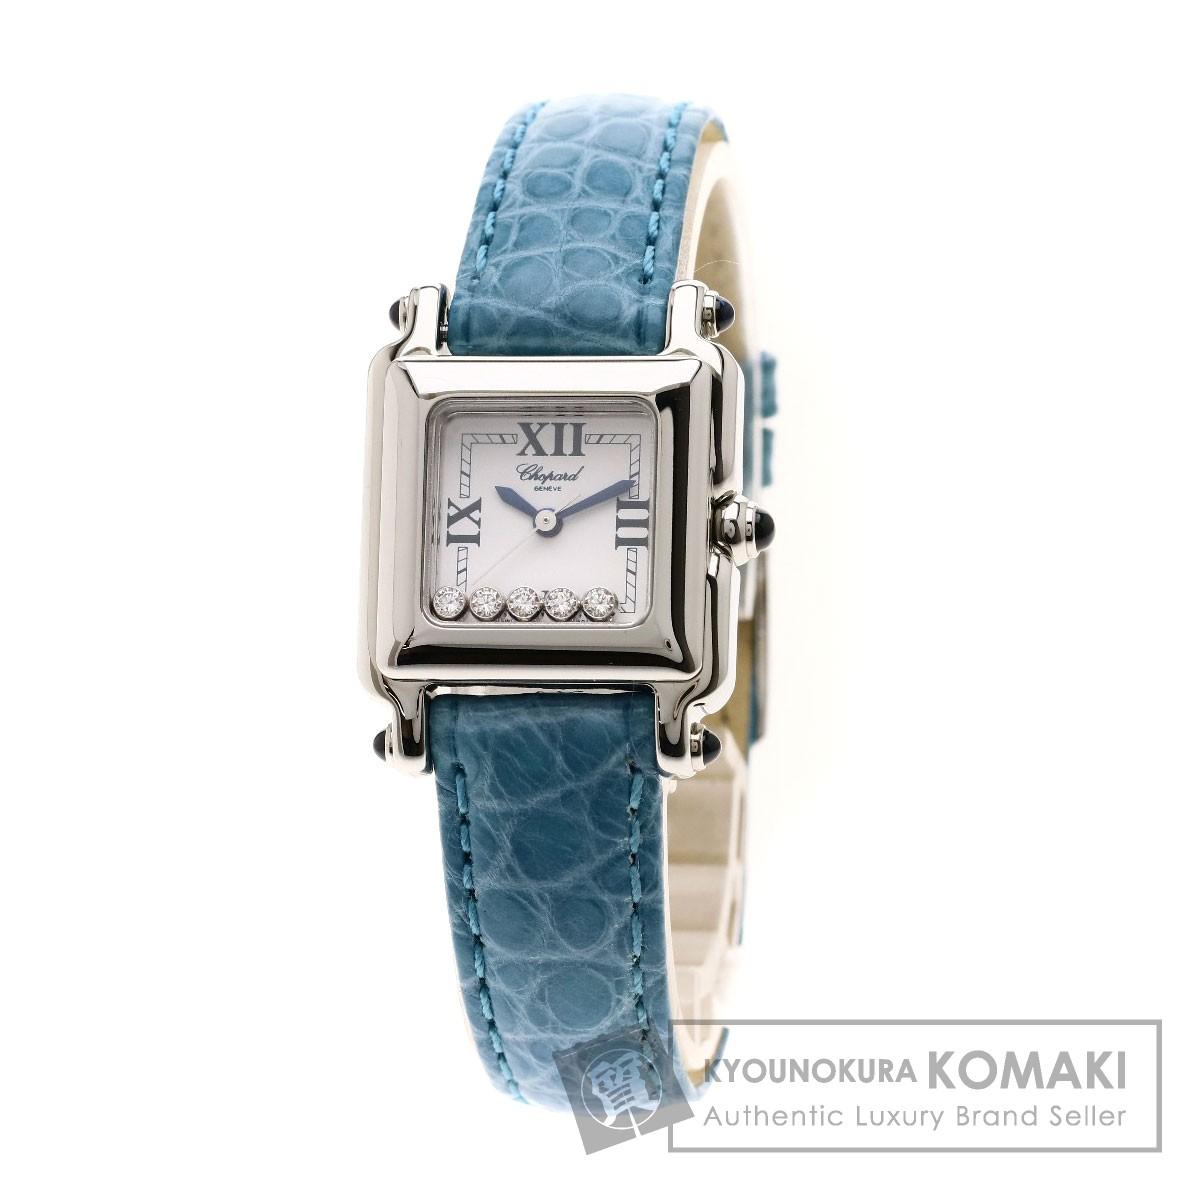 Chopard 27/8892-23 ハッピースポーツ ダイヤモンド 腕時計 ステンレススチール/革 レディース 【中古】【ショパール】